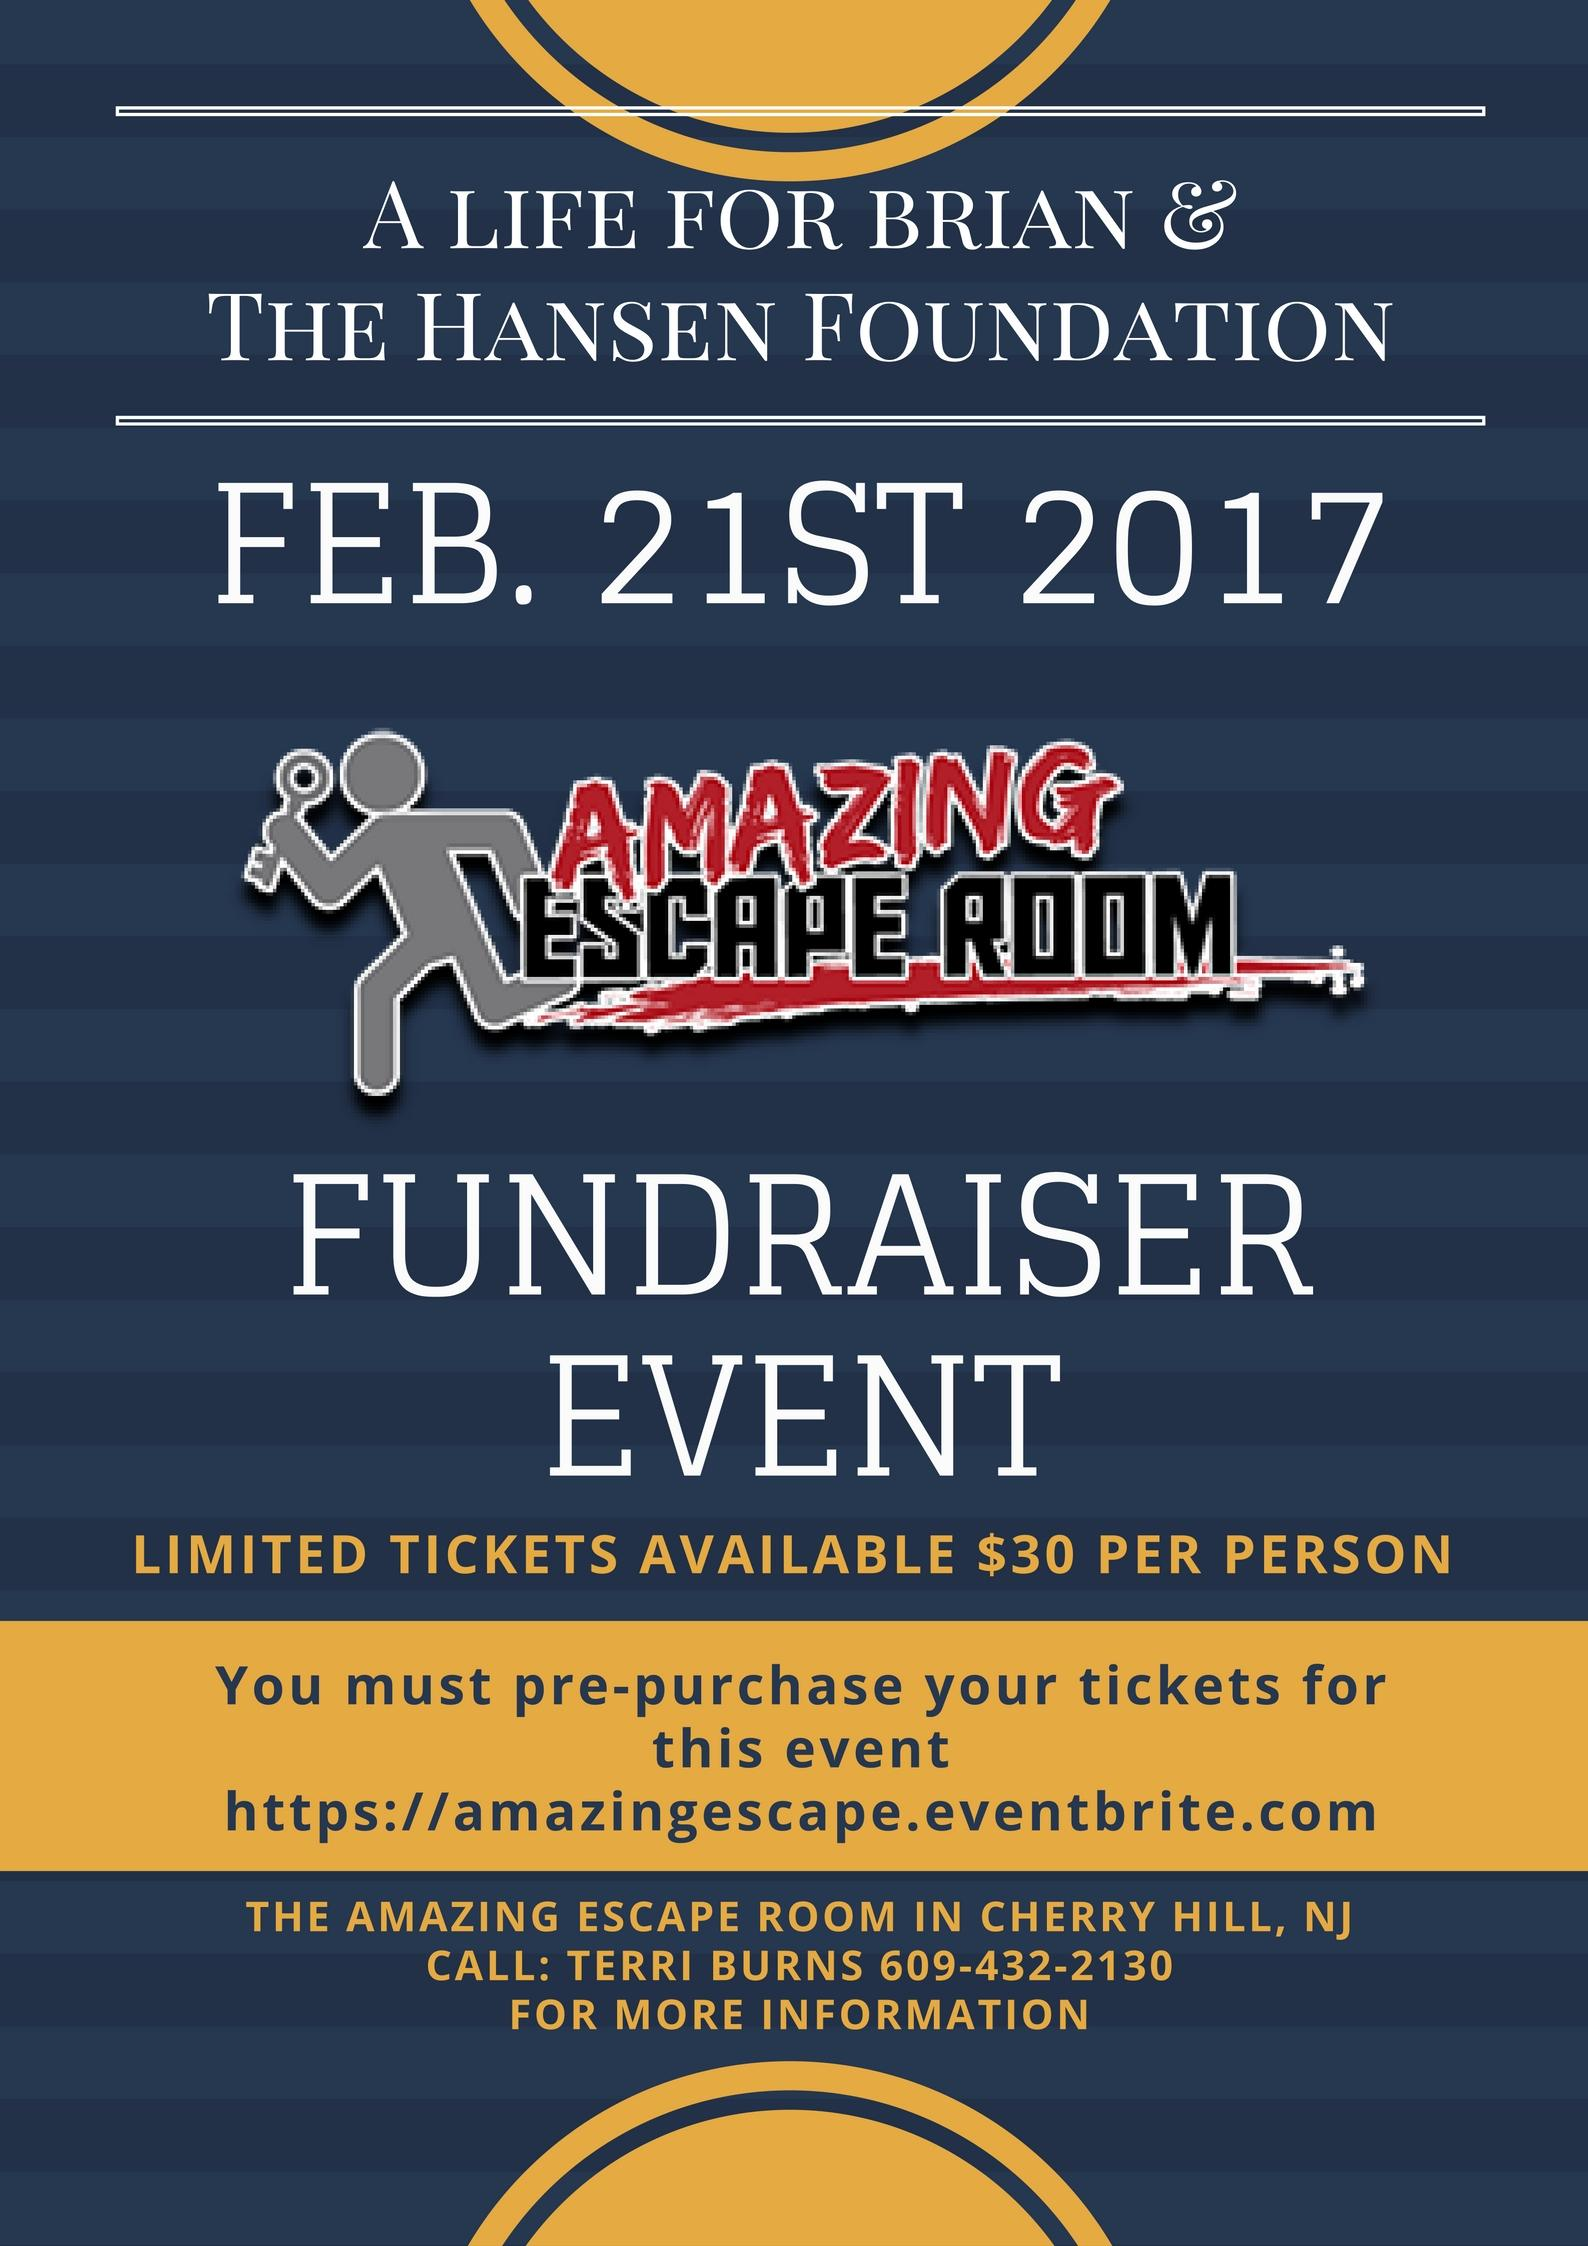 The Amazing Escape Room Fundraising Event